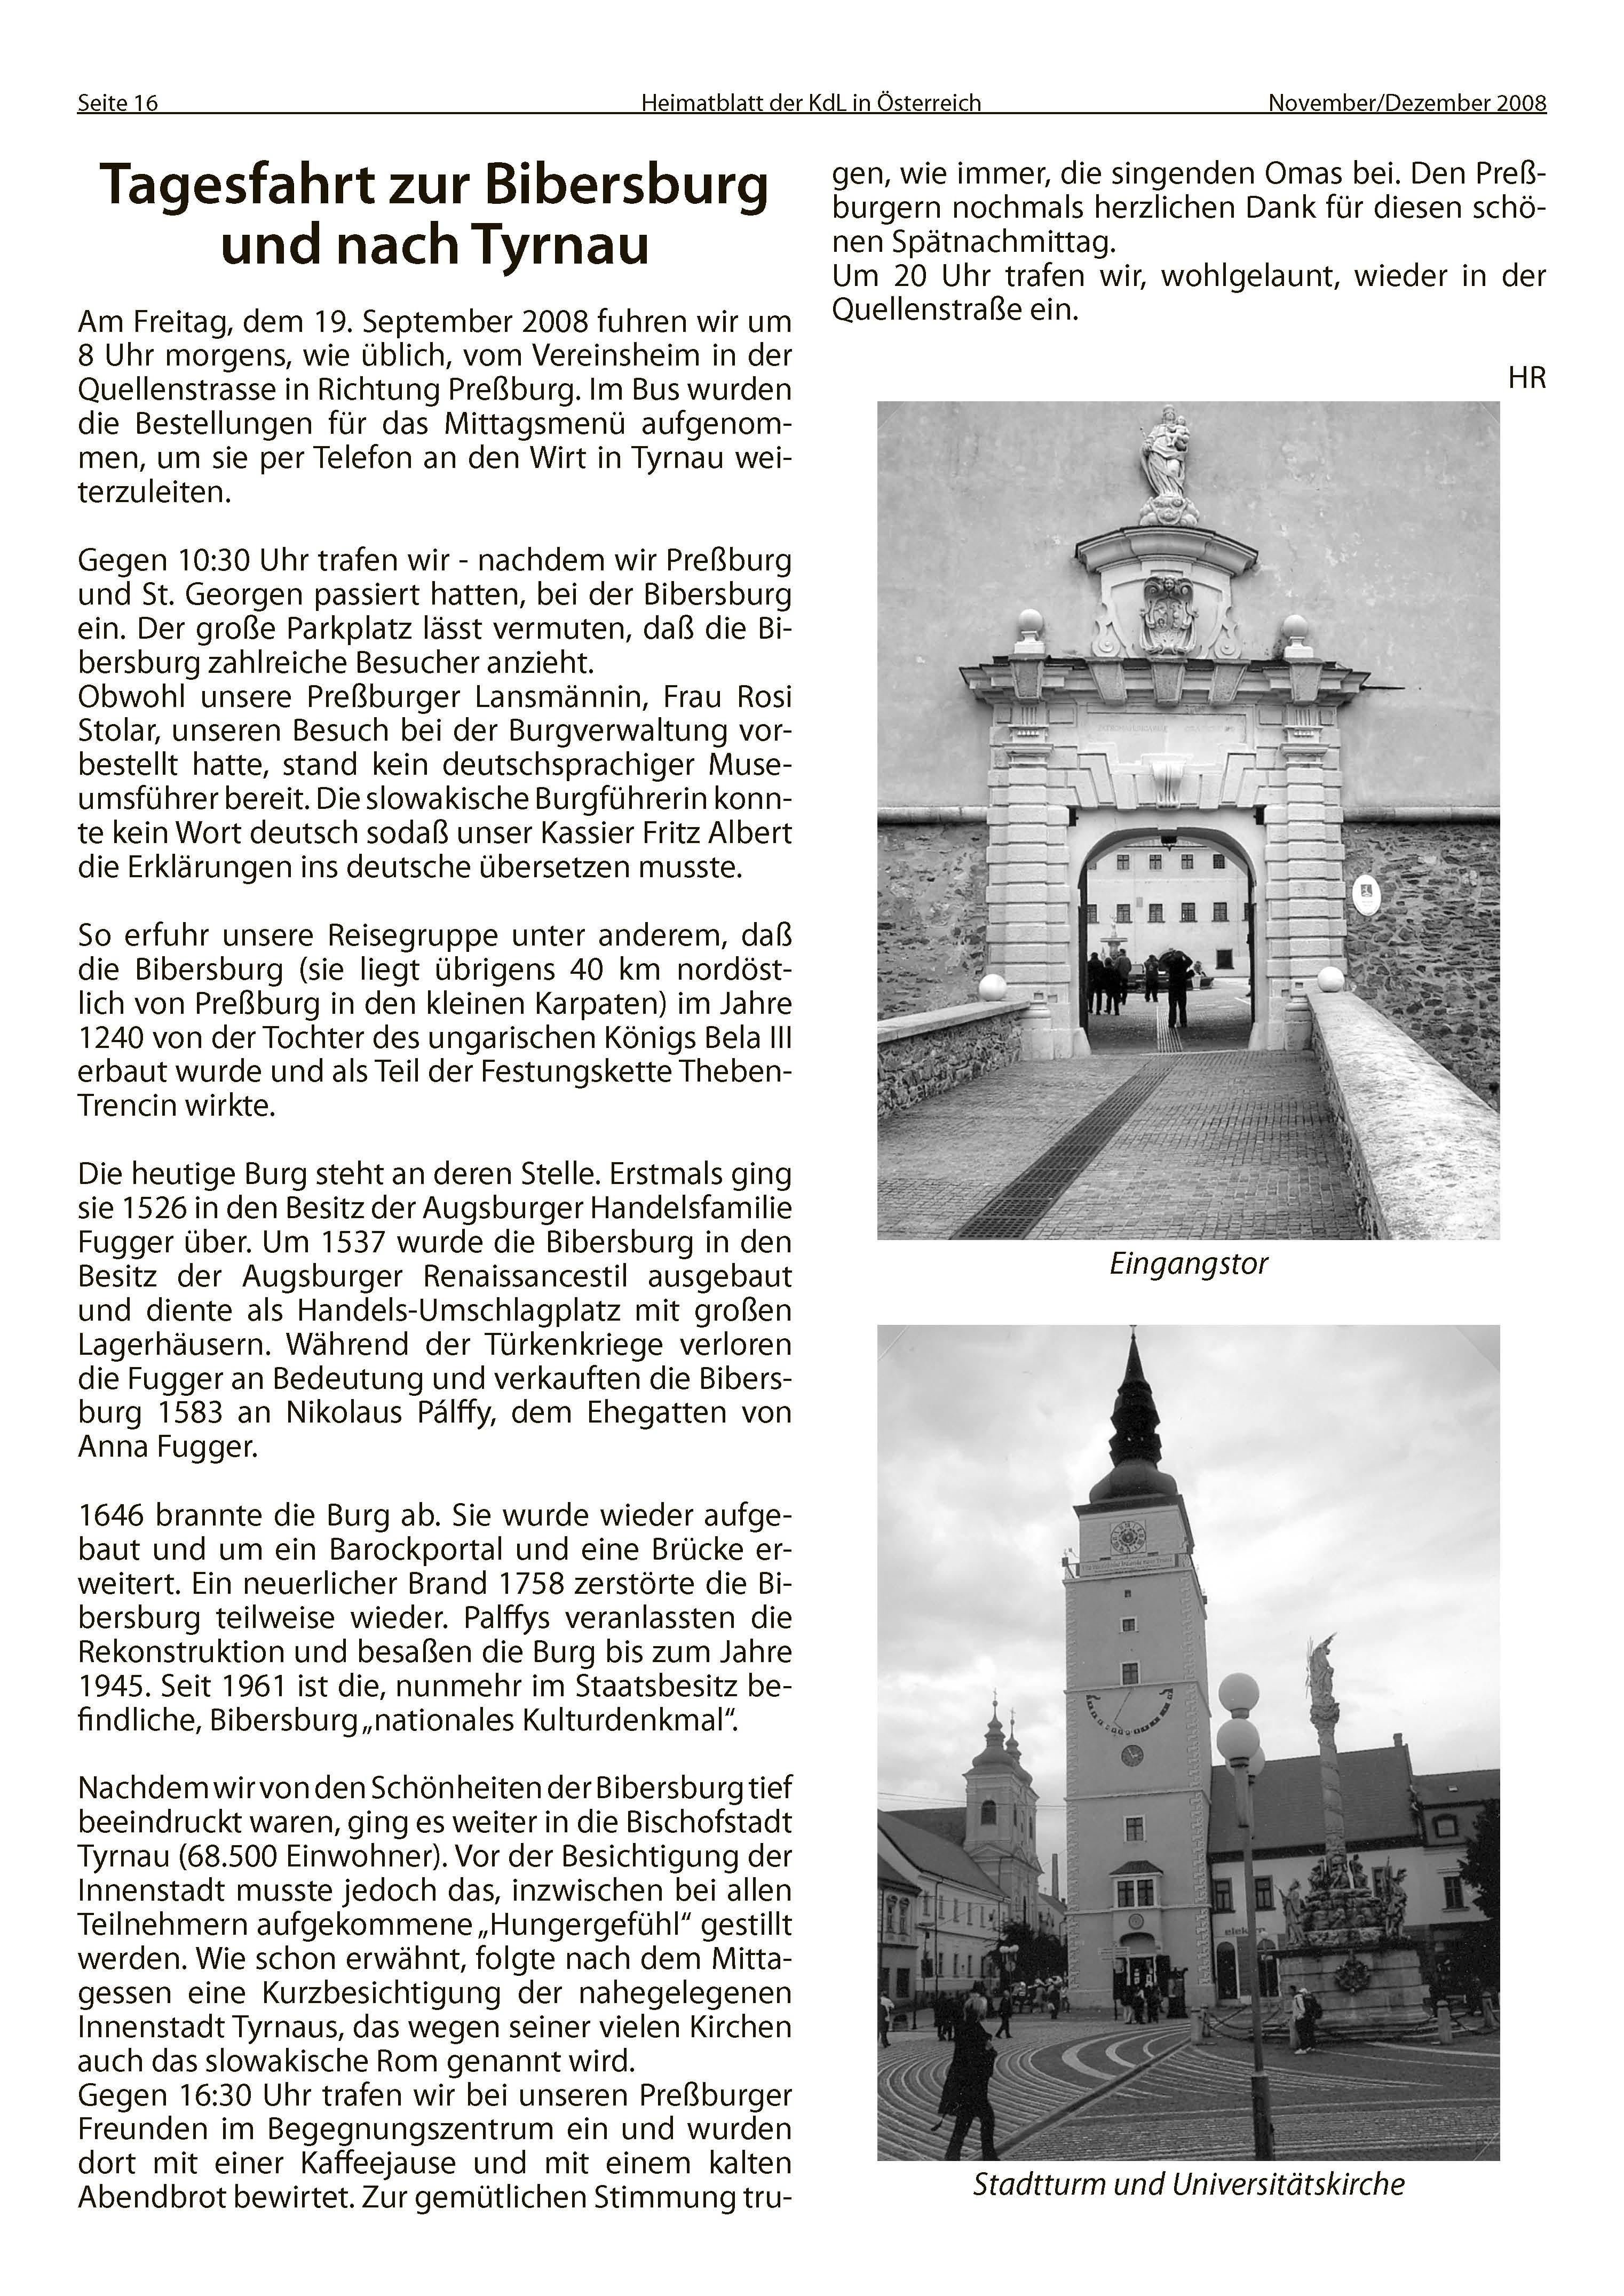 Heimatblatt_11-12_2008_Kopie_16